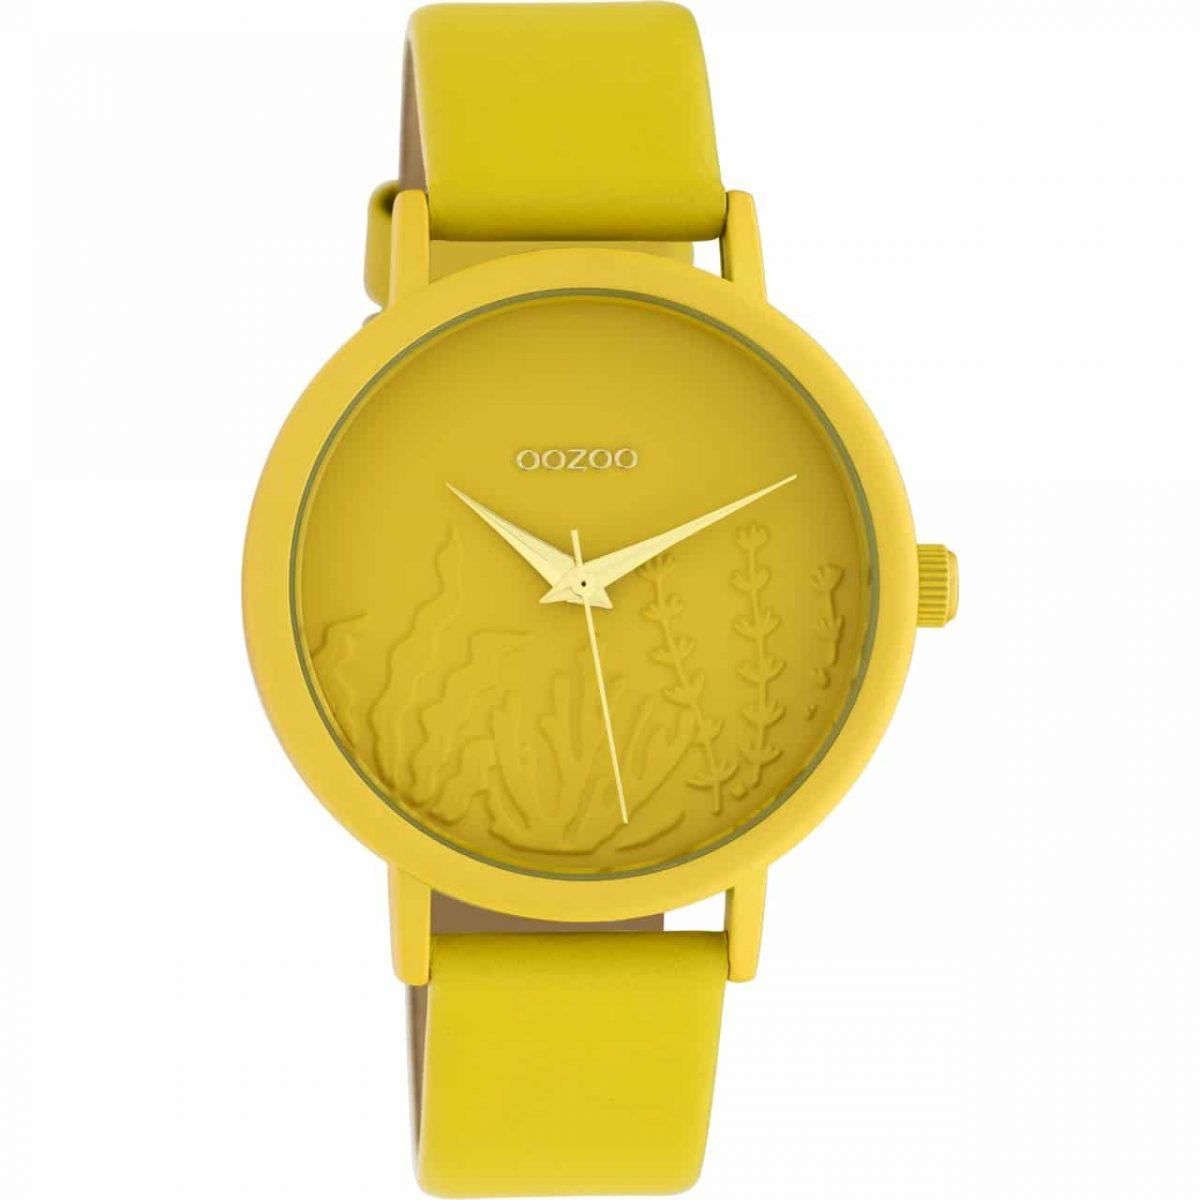 Timepieces Summer 2020 - C10602 - OOZOO